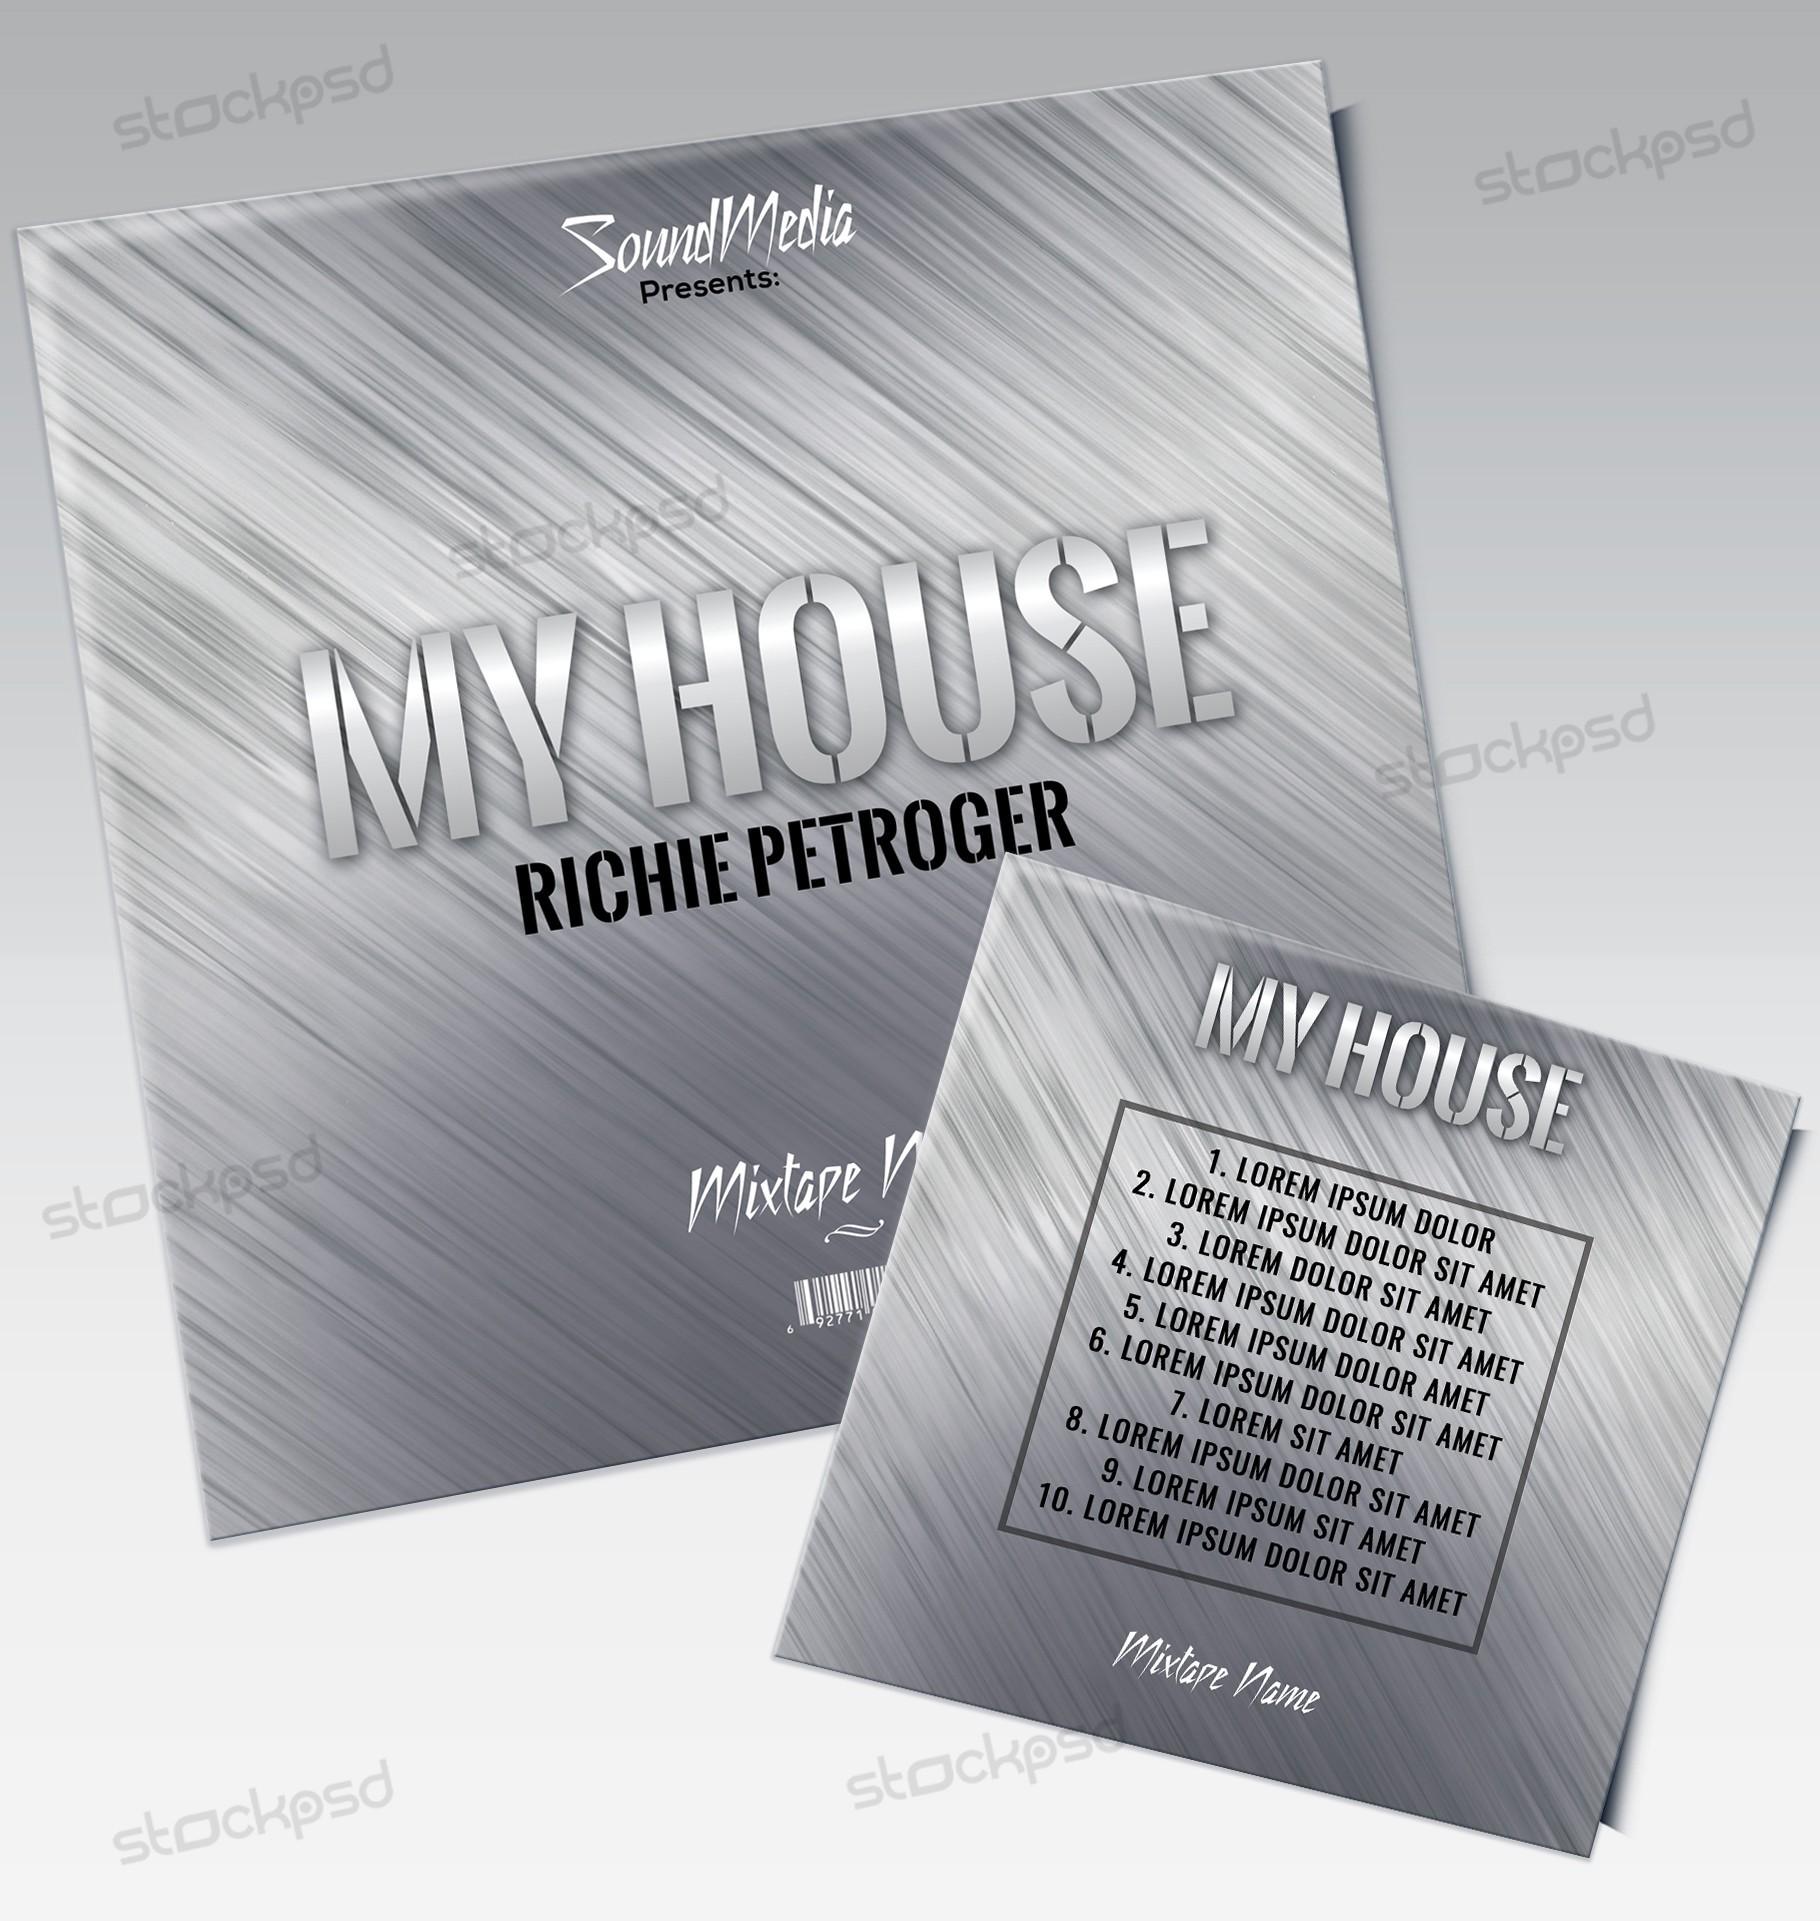 My House - Free PSD Mixtape Cover Artwork - Free PSD Flyer